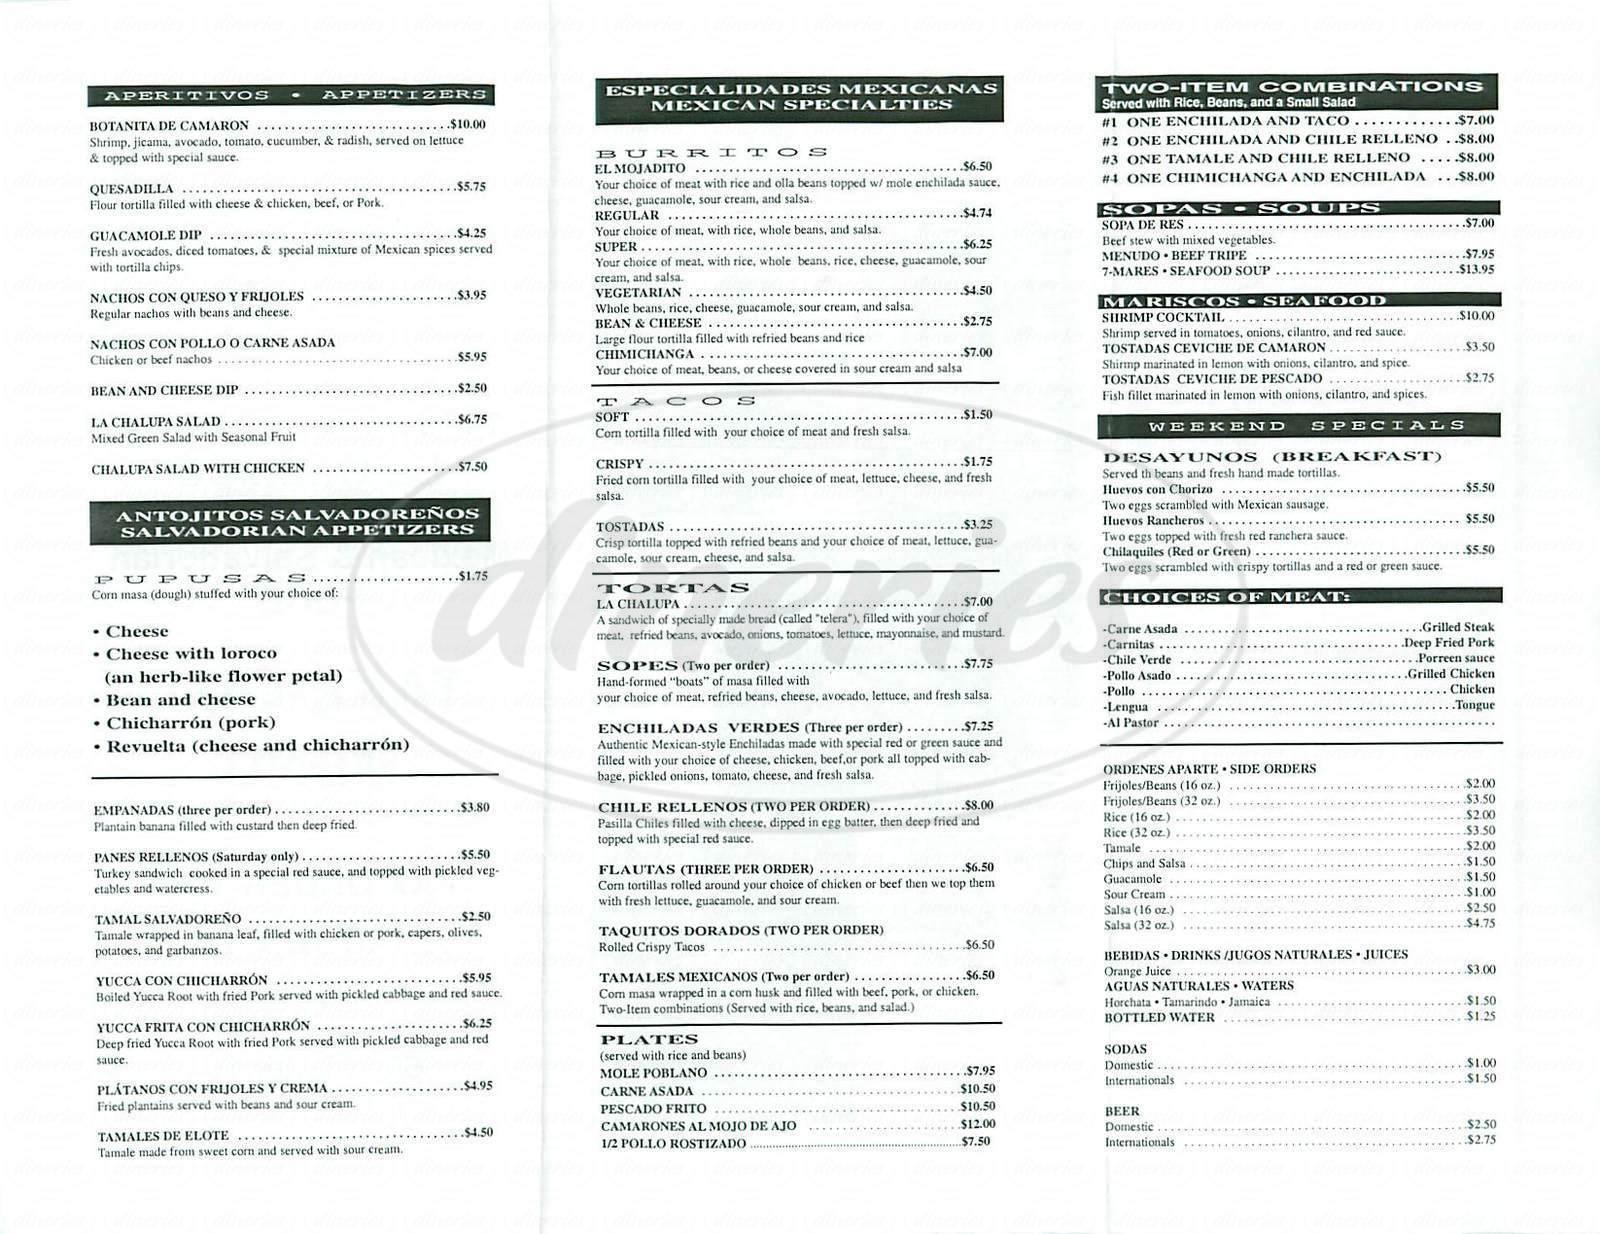 menu for La Chalupa